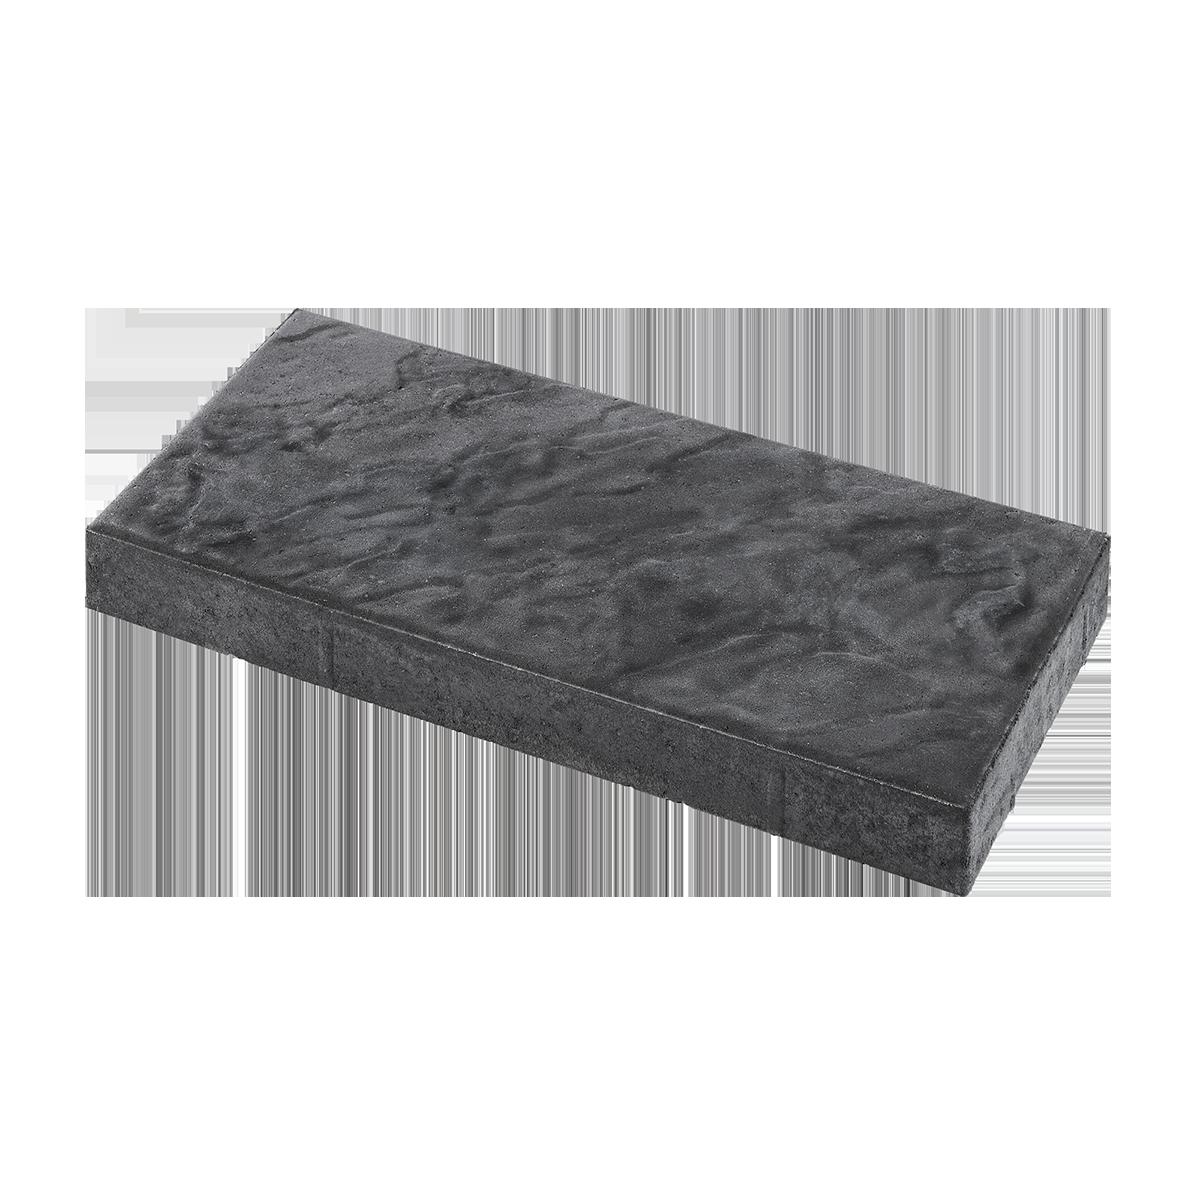 Skiferpræg 30x60x6 cm Sort/Antracit